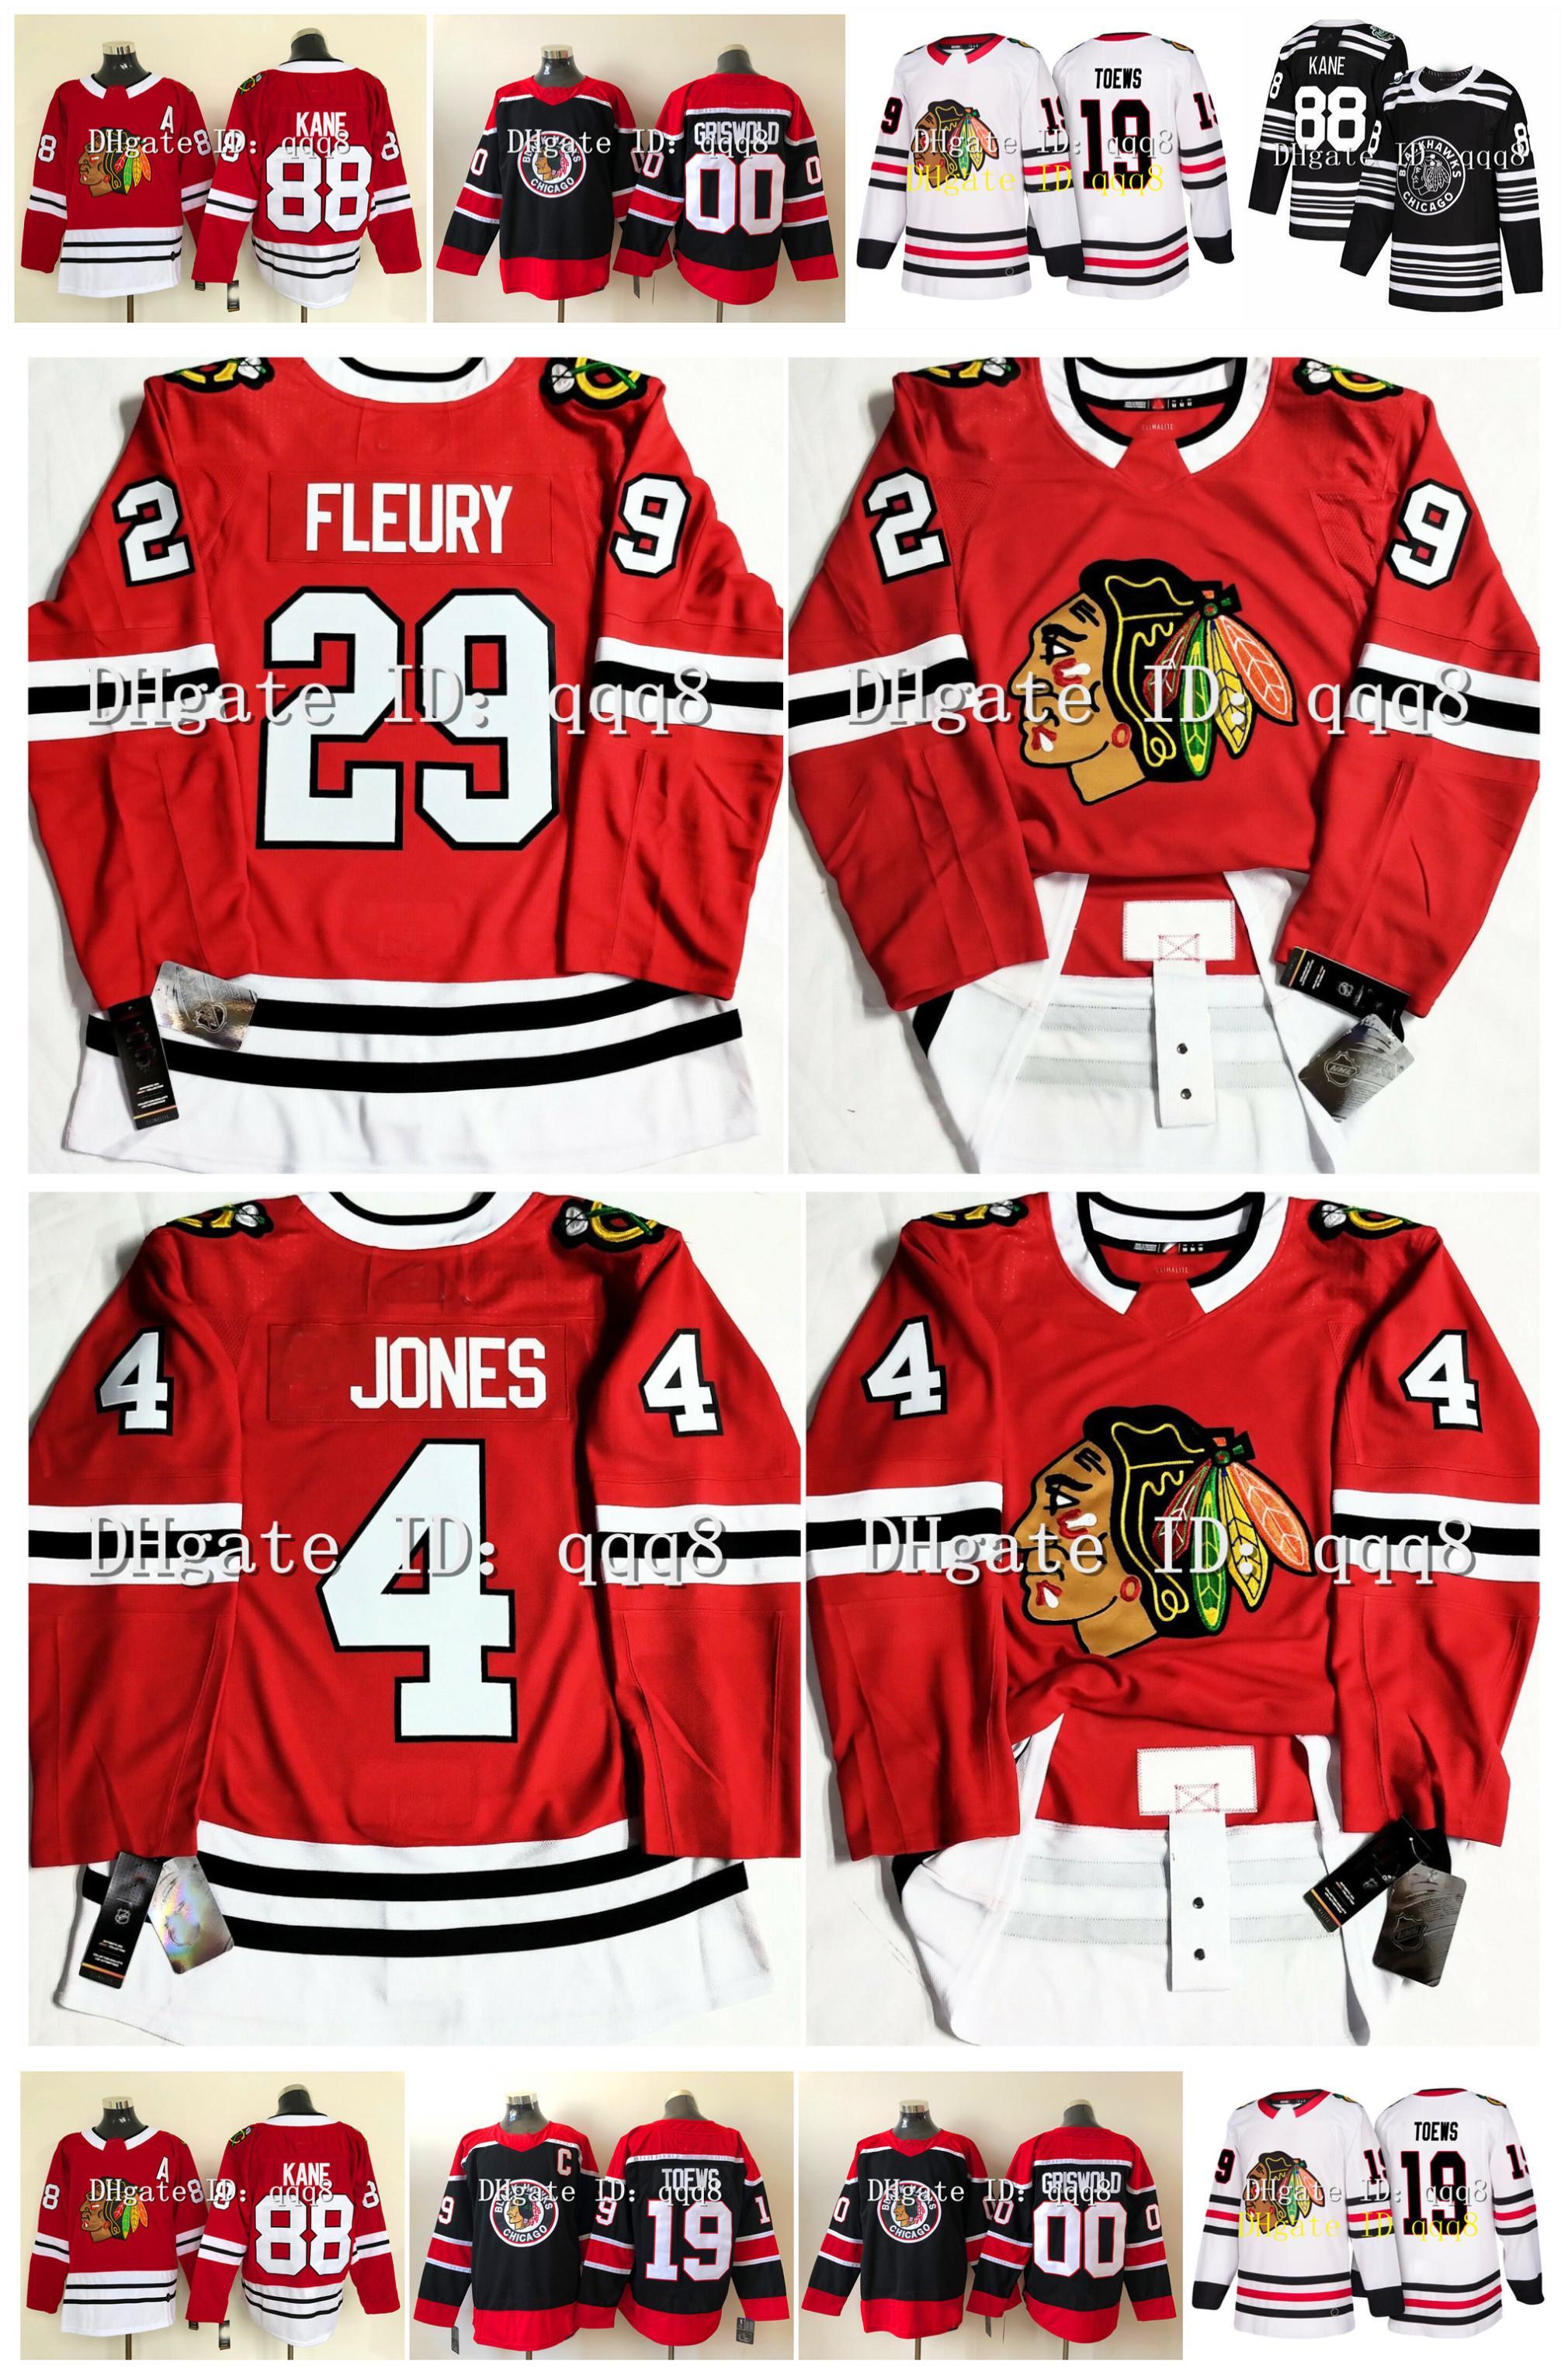 Chicago Blackhawks Jersey 29 Marc-Andre Fleury 4 Seth Jones 19 Jonathan Toews 88 Patrick Kane 00 Clark Griswold 12 Alex DeBrincat Reverse Retro Hockey